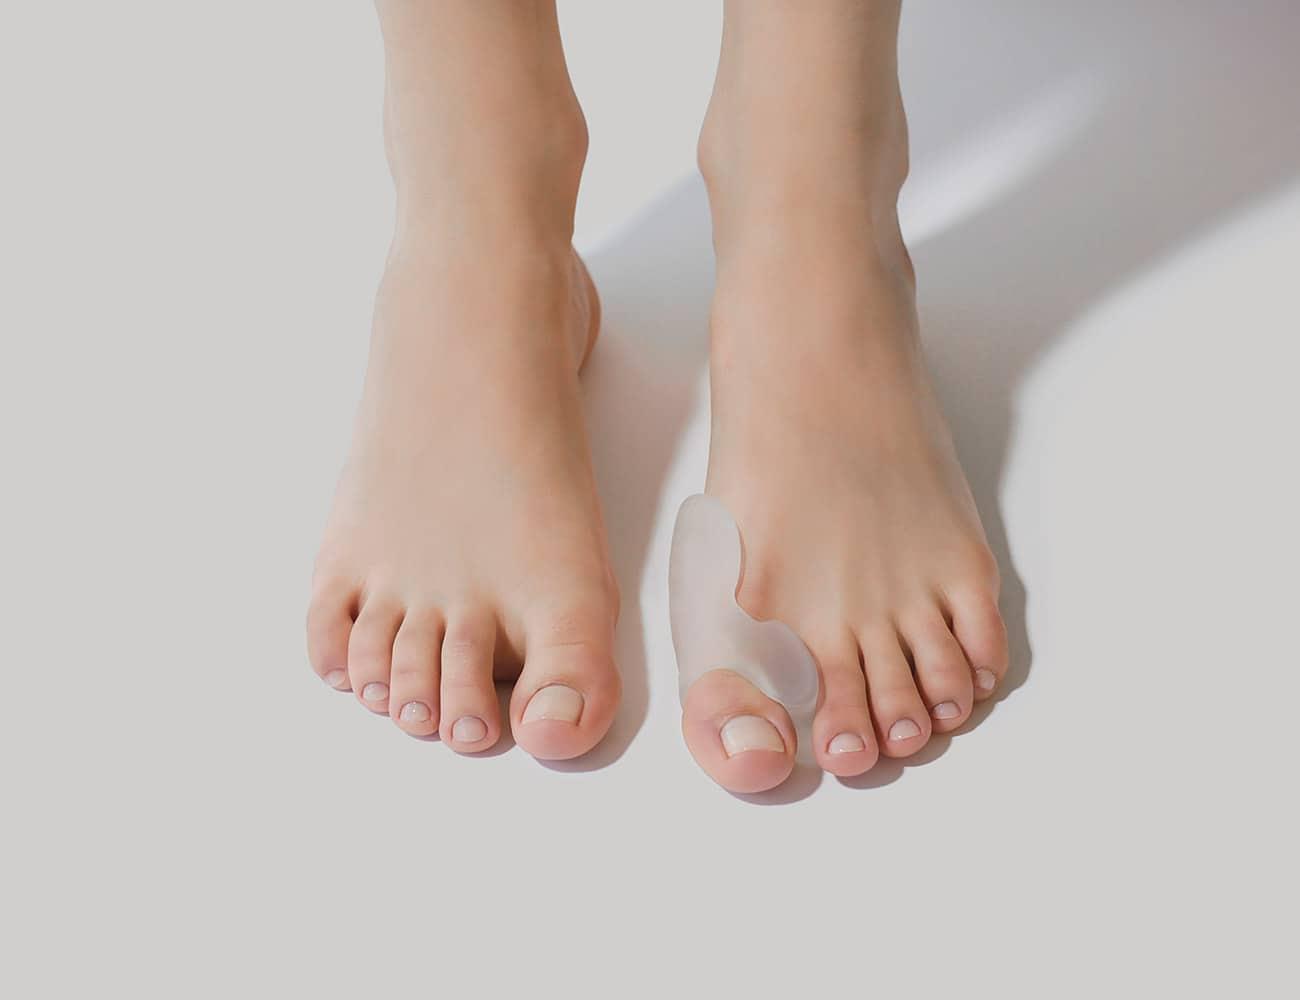 foot with bunion cushion